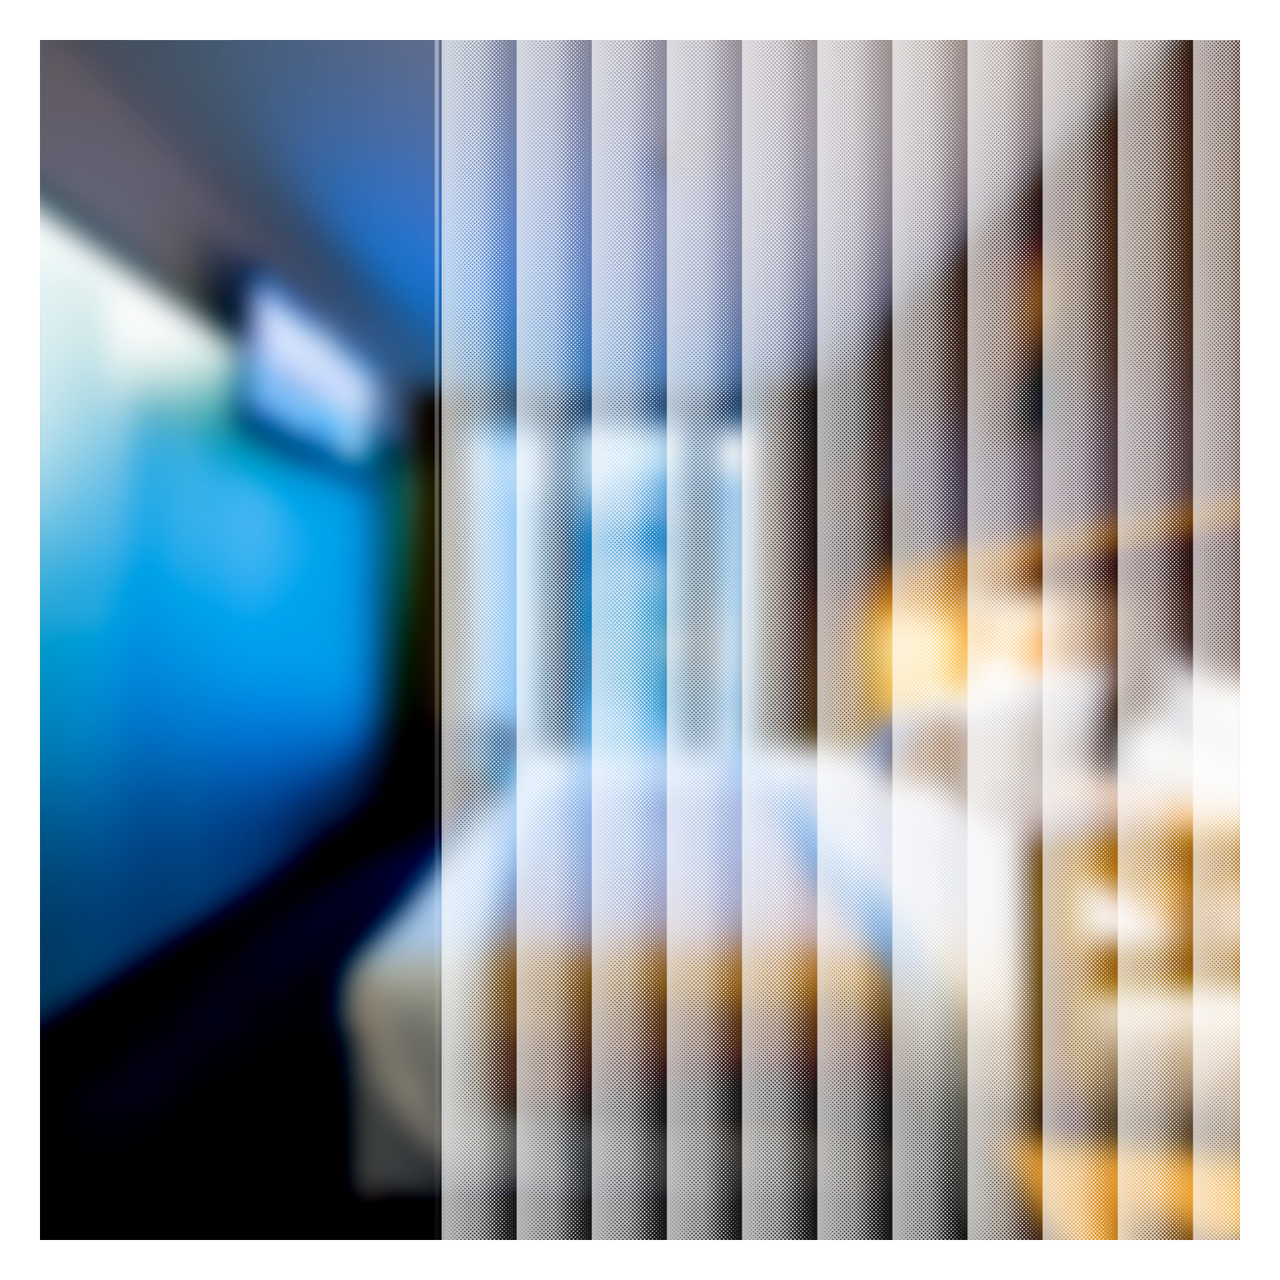 BDF 4CD Curtain Dot Decorative Window Film 25in X 7ft by BuyDecorativeFilm